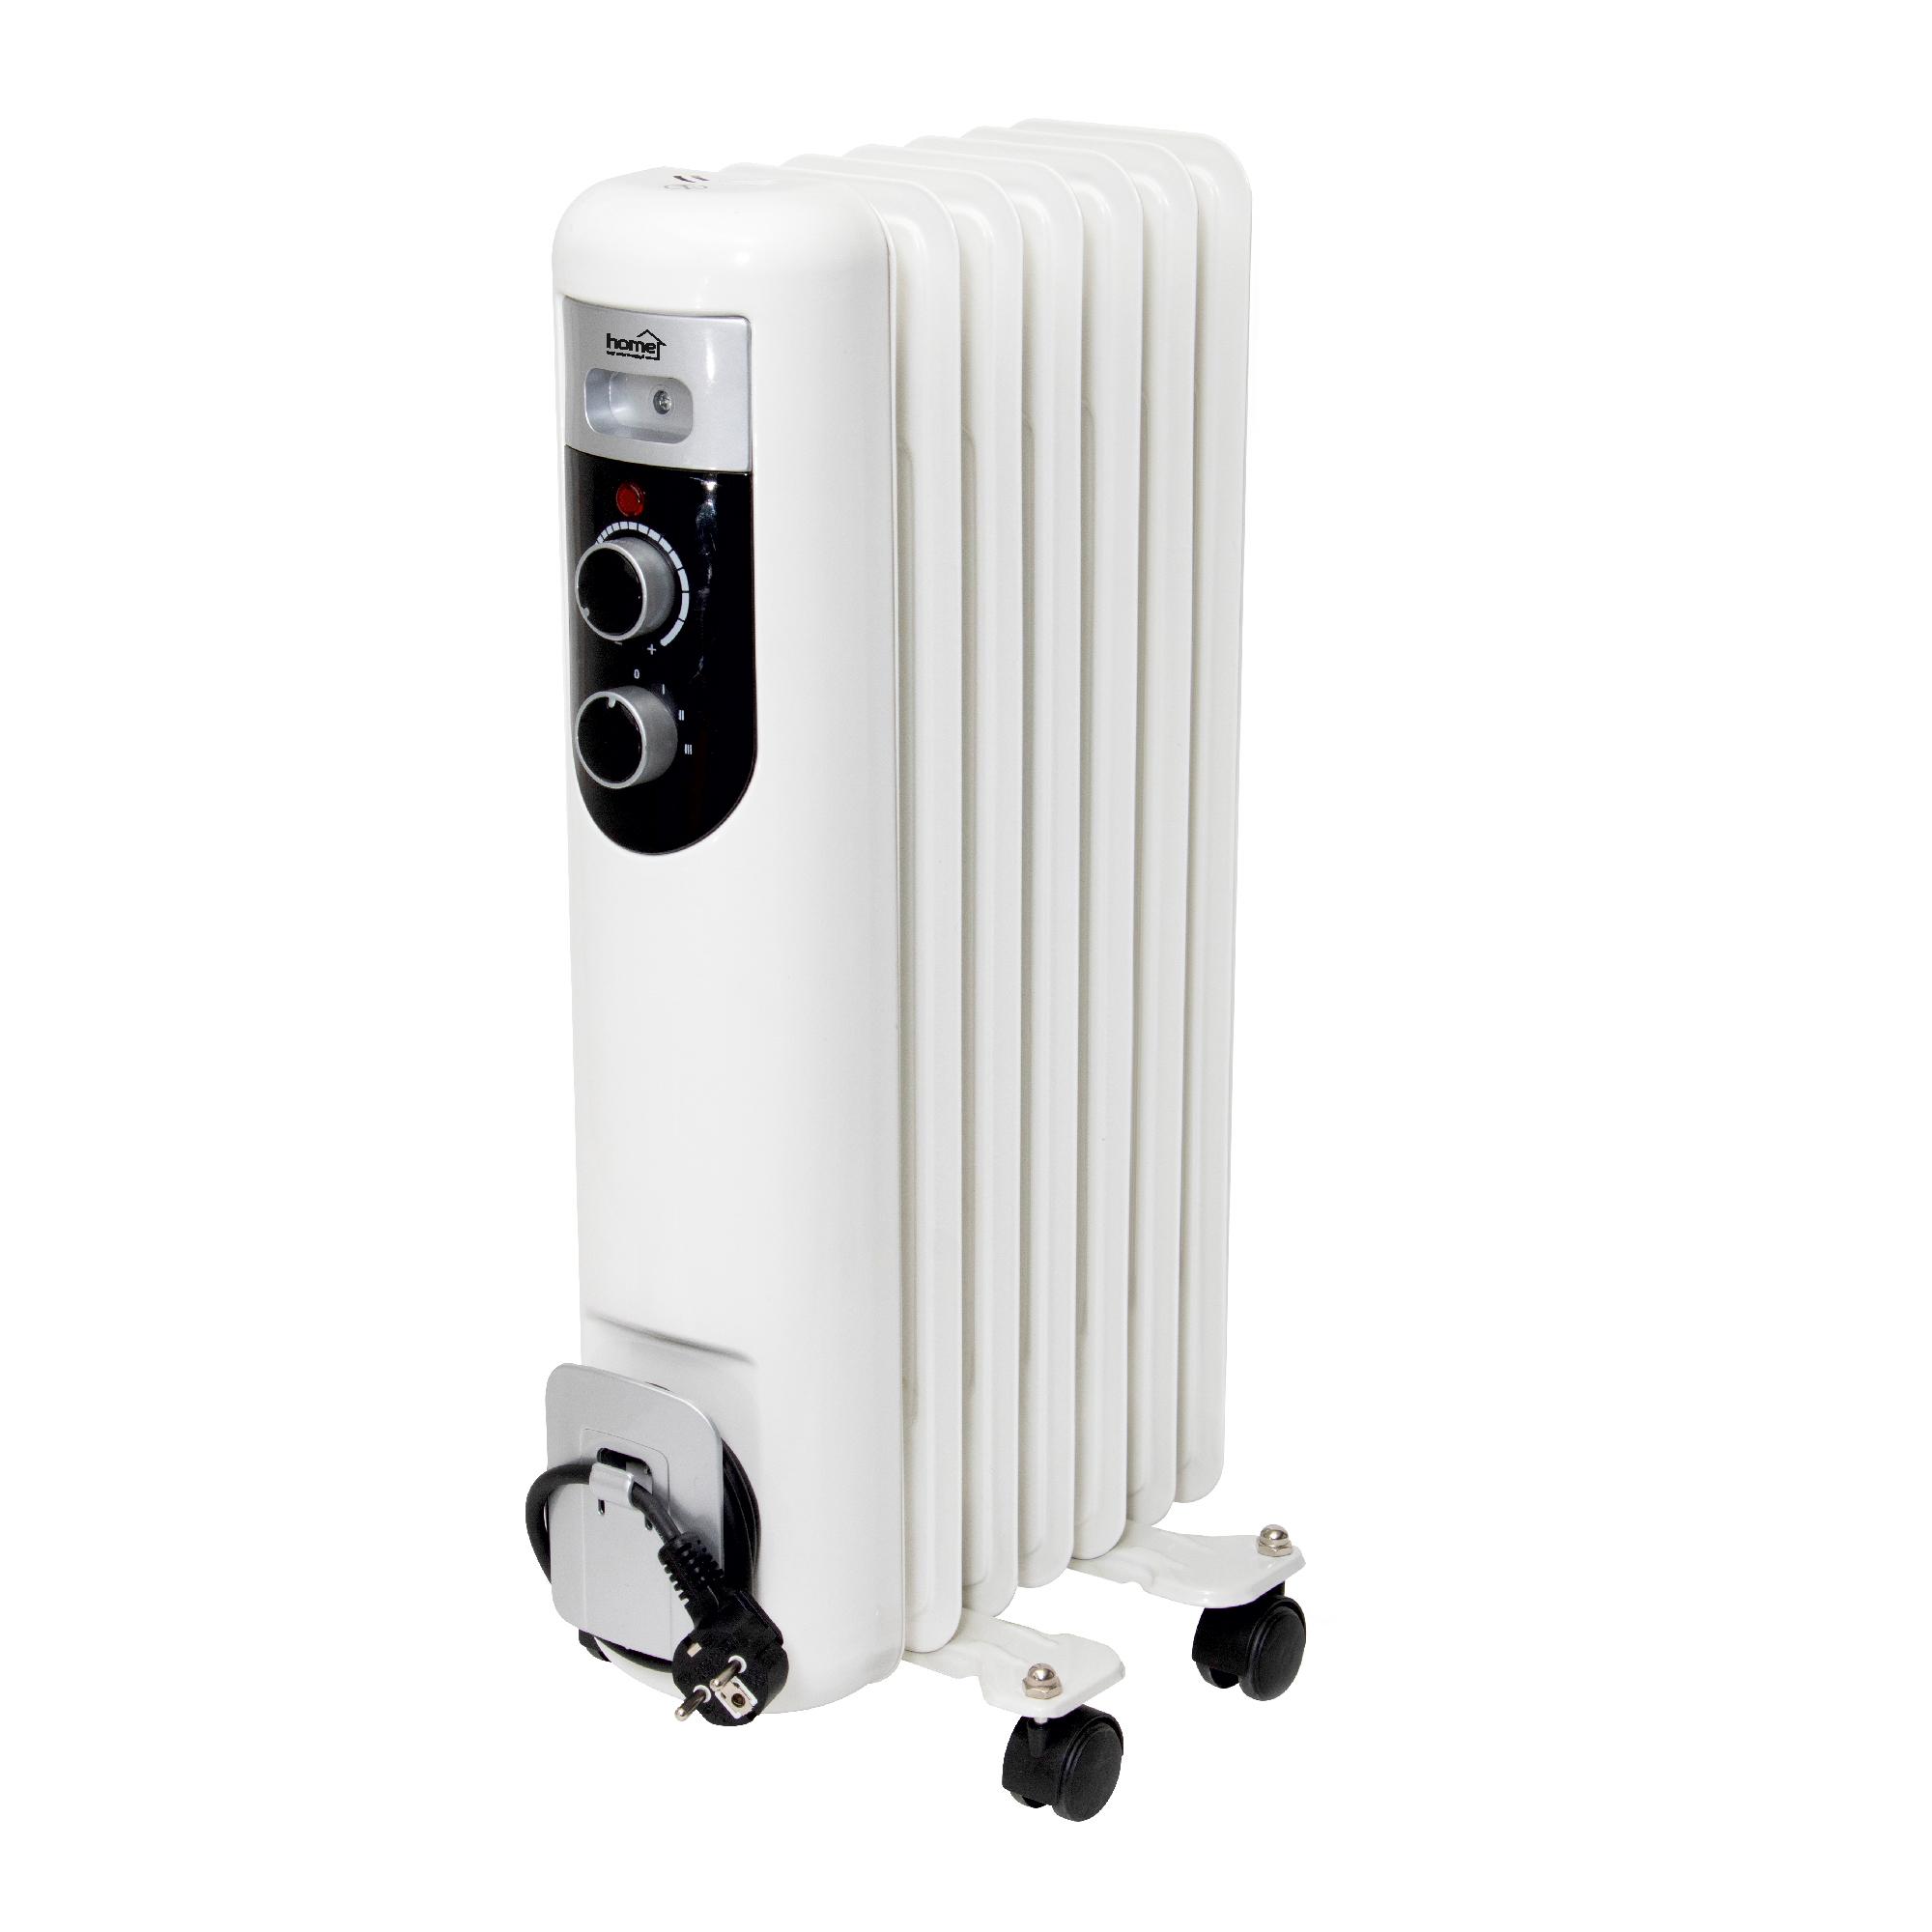 Calorifer electric cu ulei Home by Somogyi FKOS 7M, 2 panouri convectoare, 1500W, aluminiu, alb, 60 x 37 cm imagine 2021 mathaus